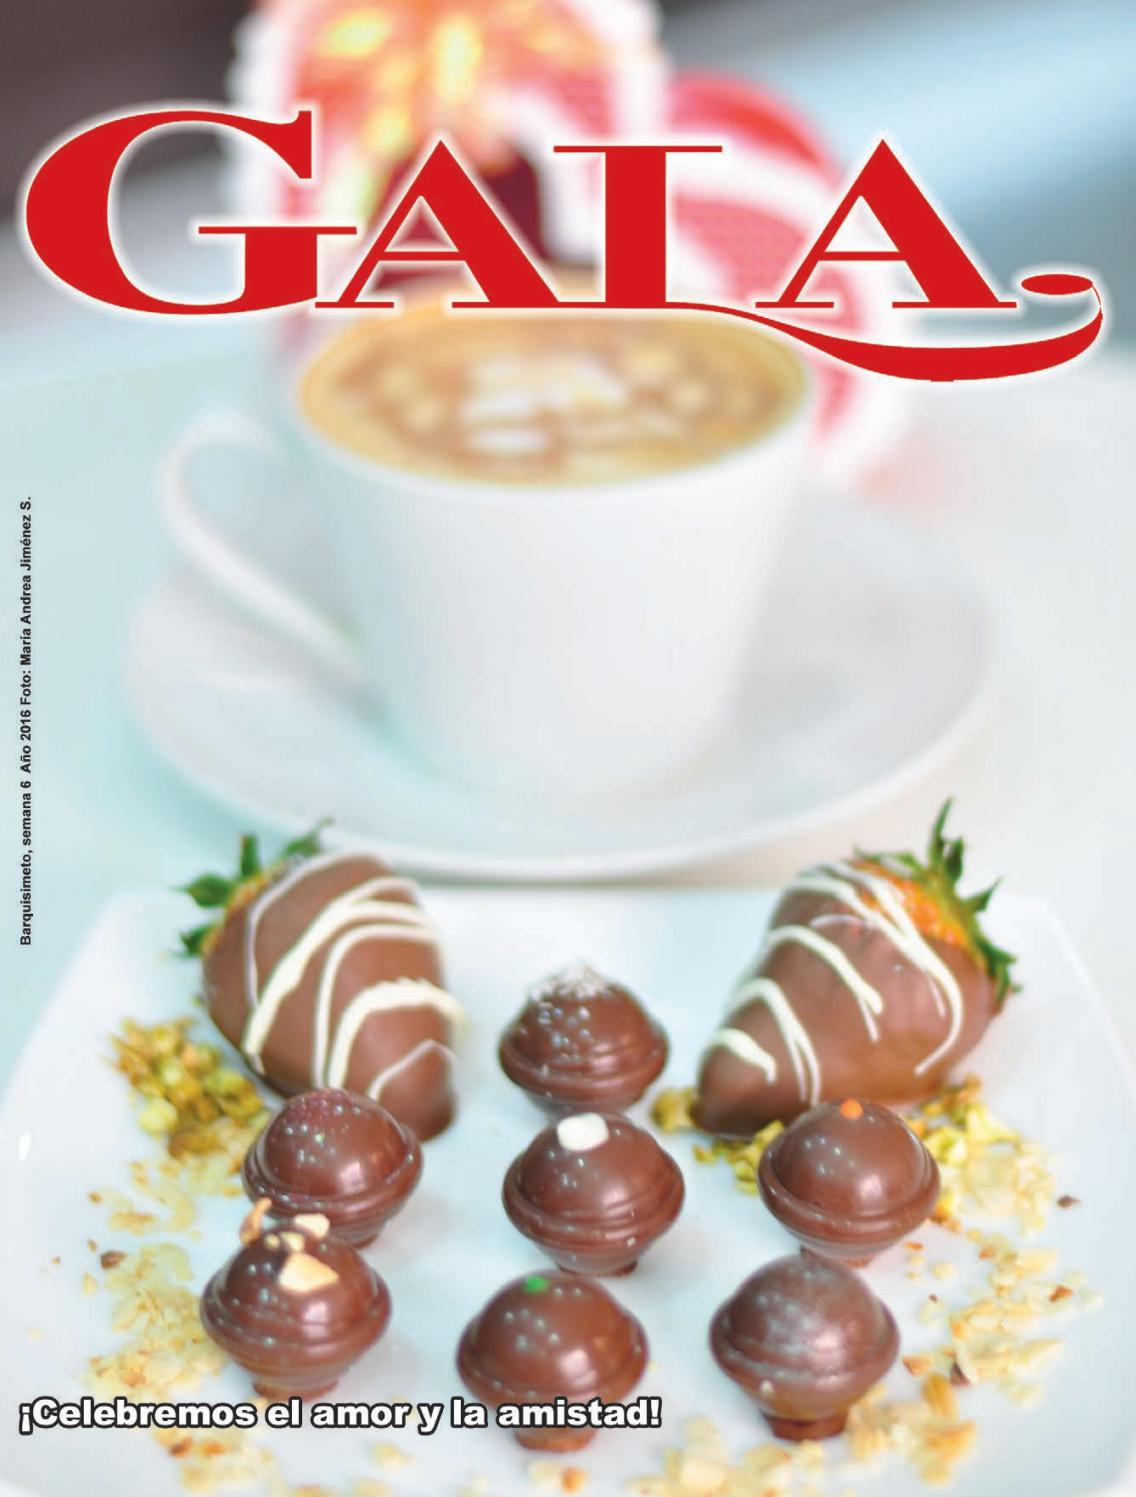 Andrea Jimenez Desnuda celebremos: gala 07/02/2016el impulso de gala - issuu